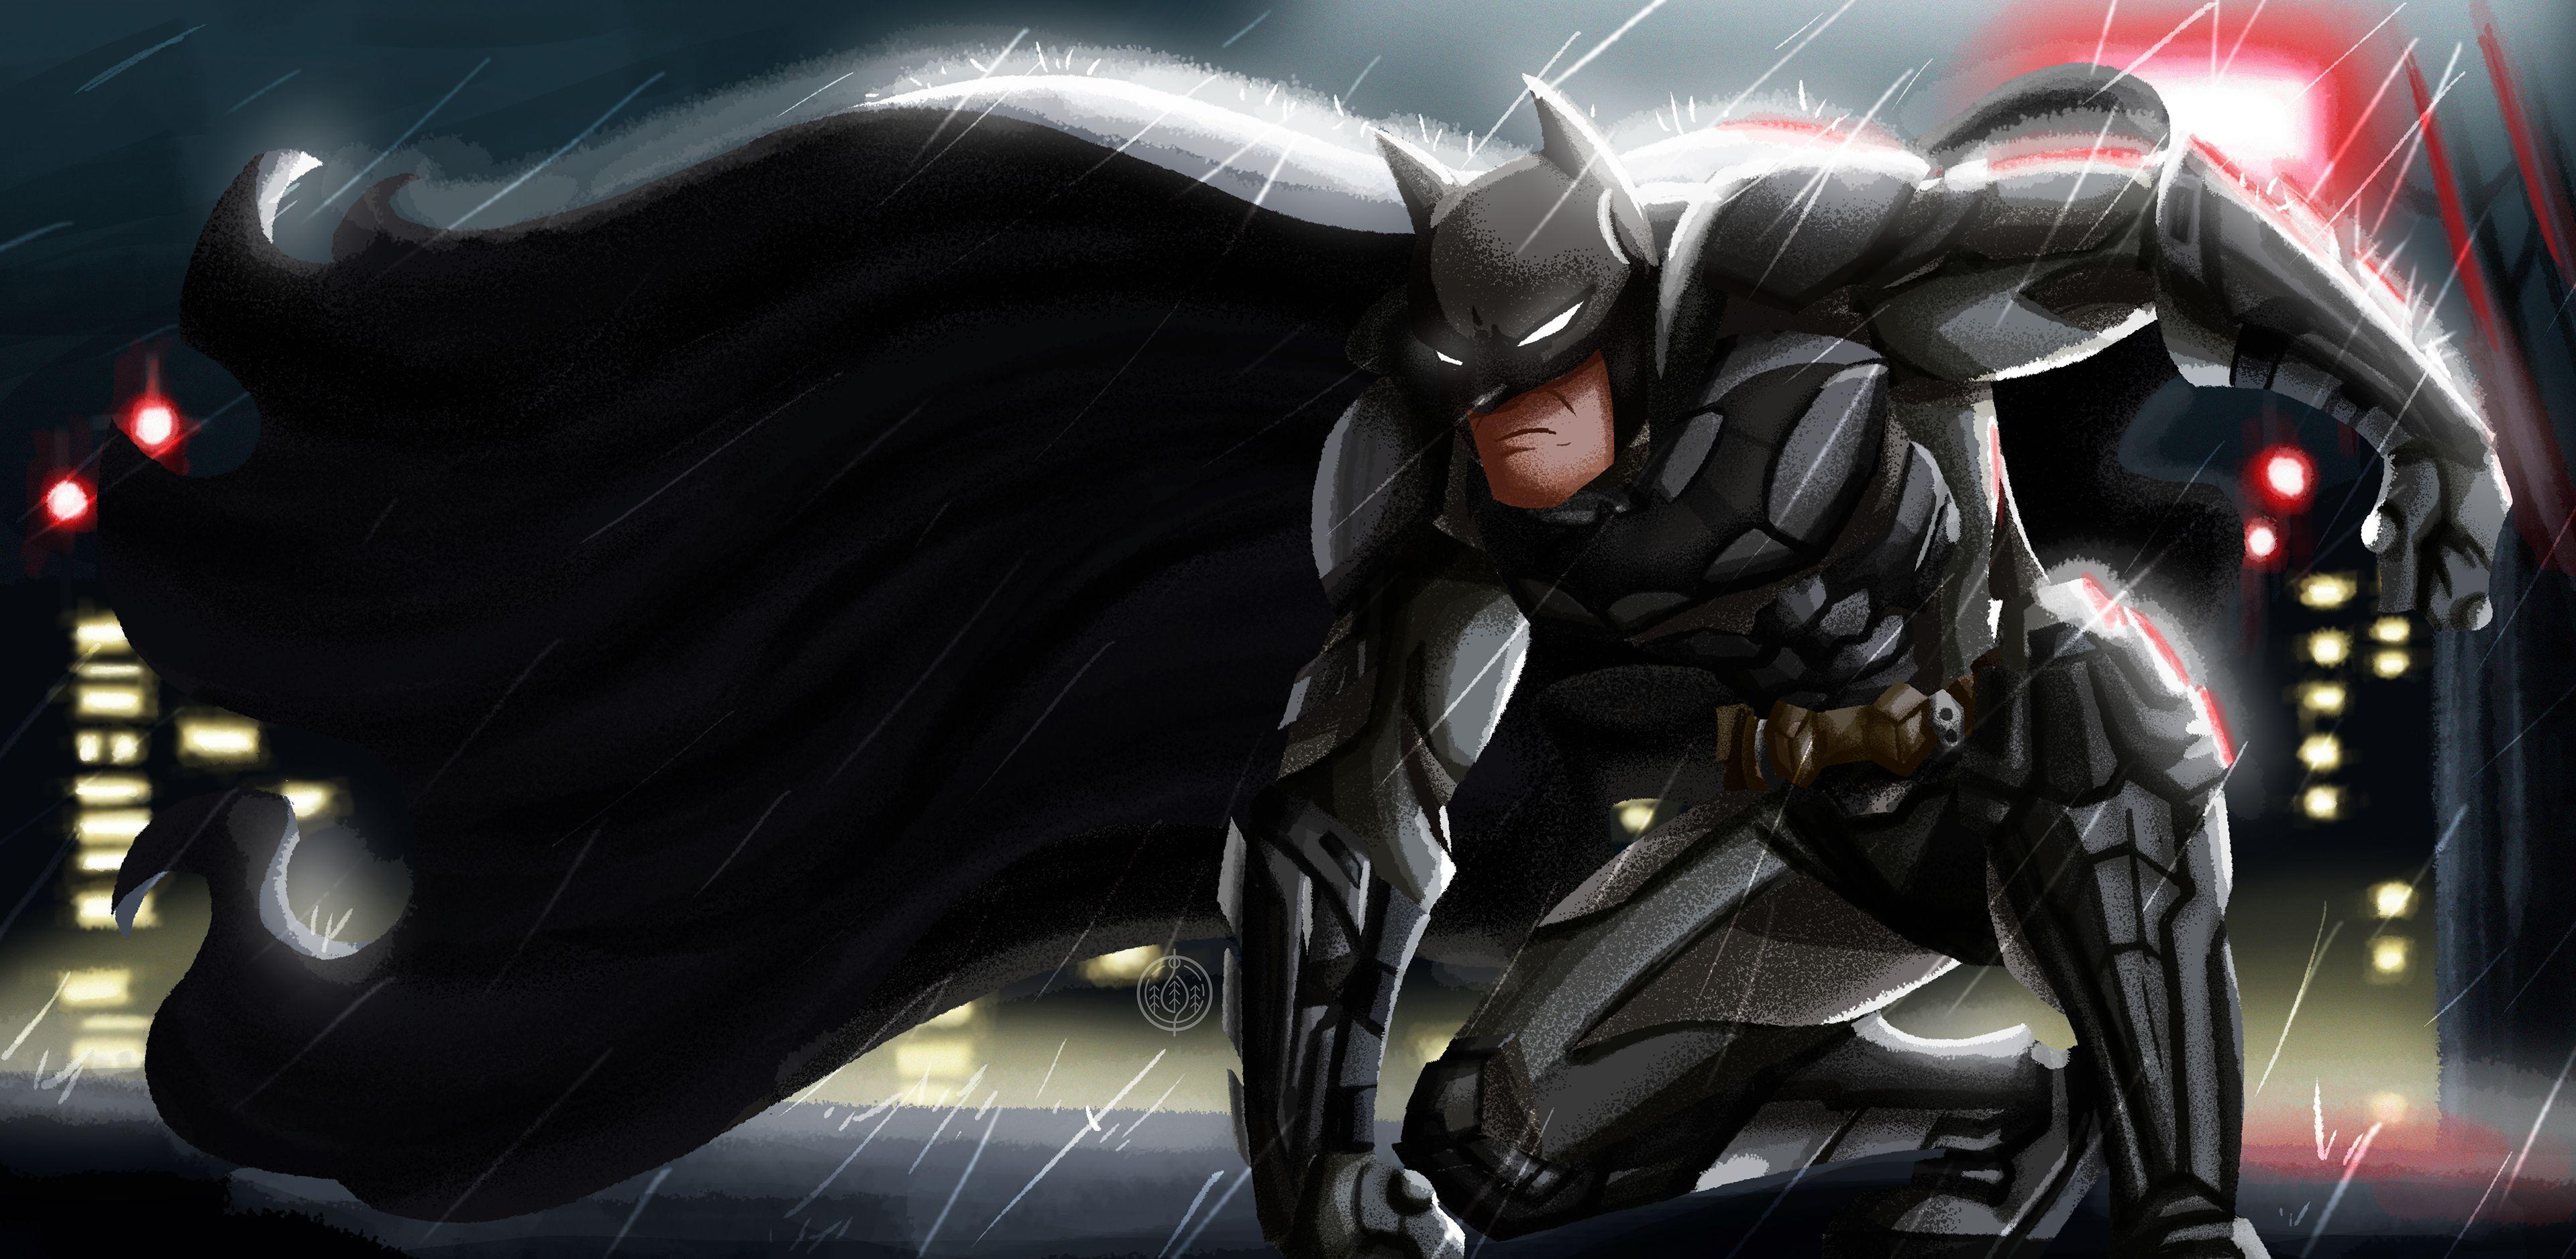 Batman Illustration 4k New Superheroes Wallpapers Hd Wallpapers